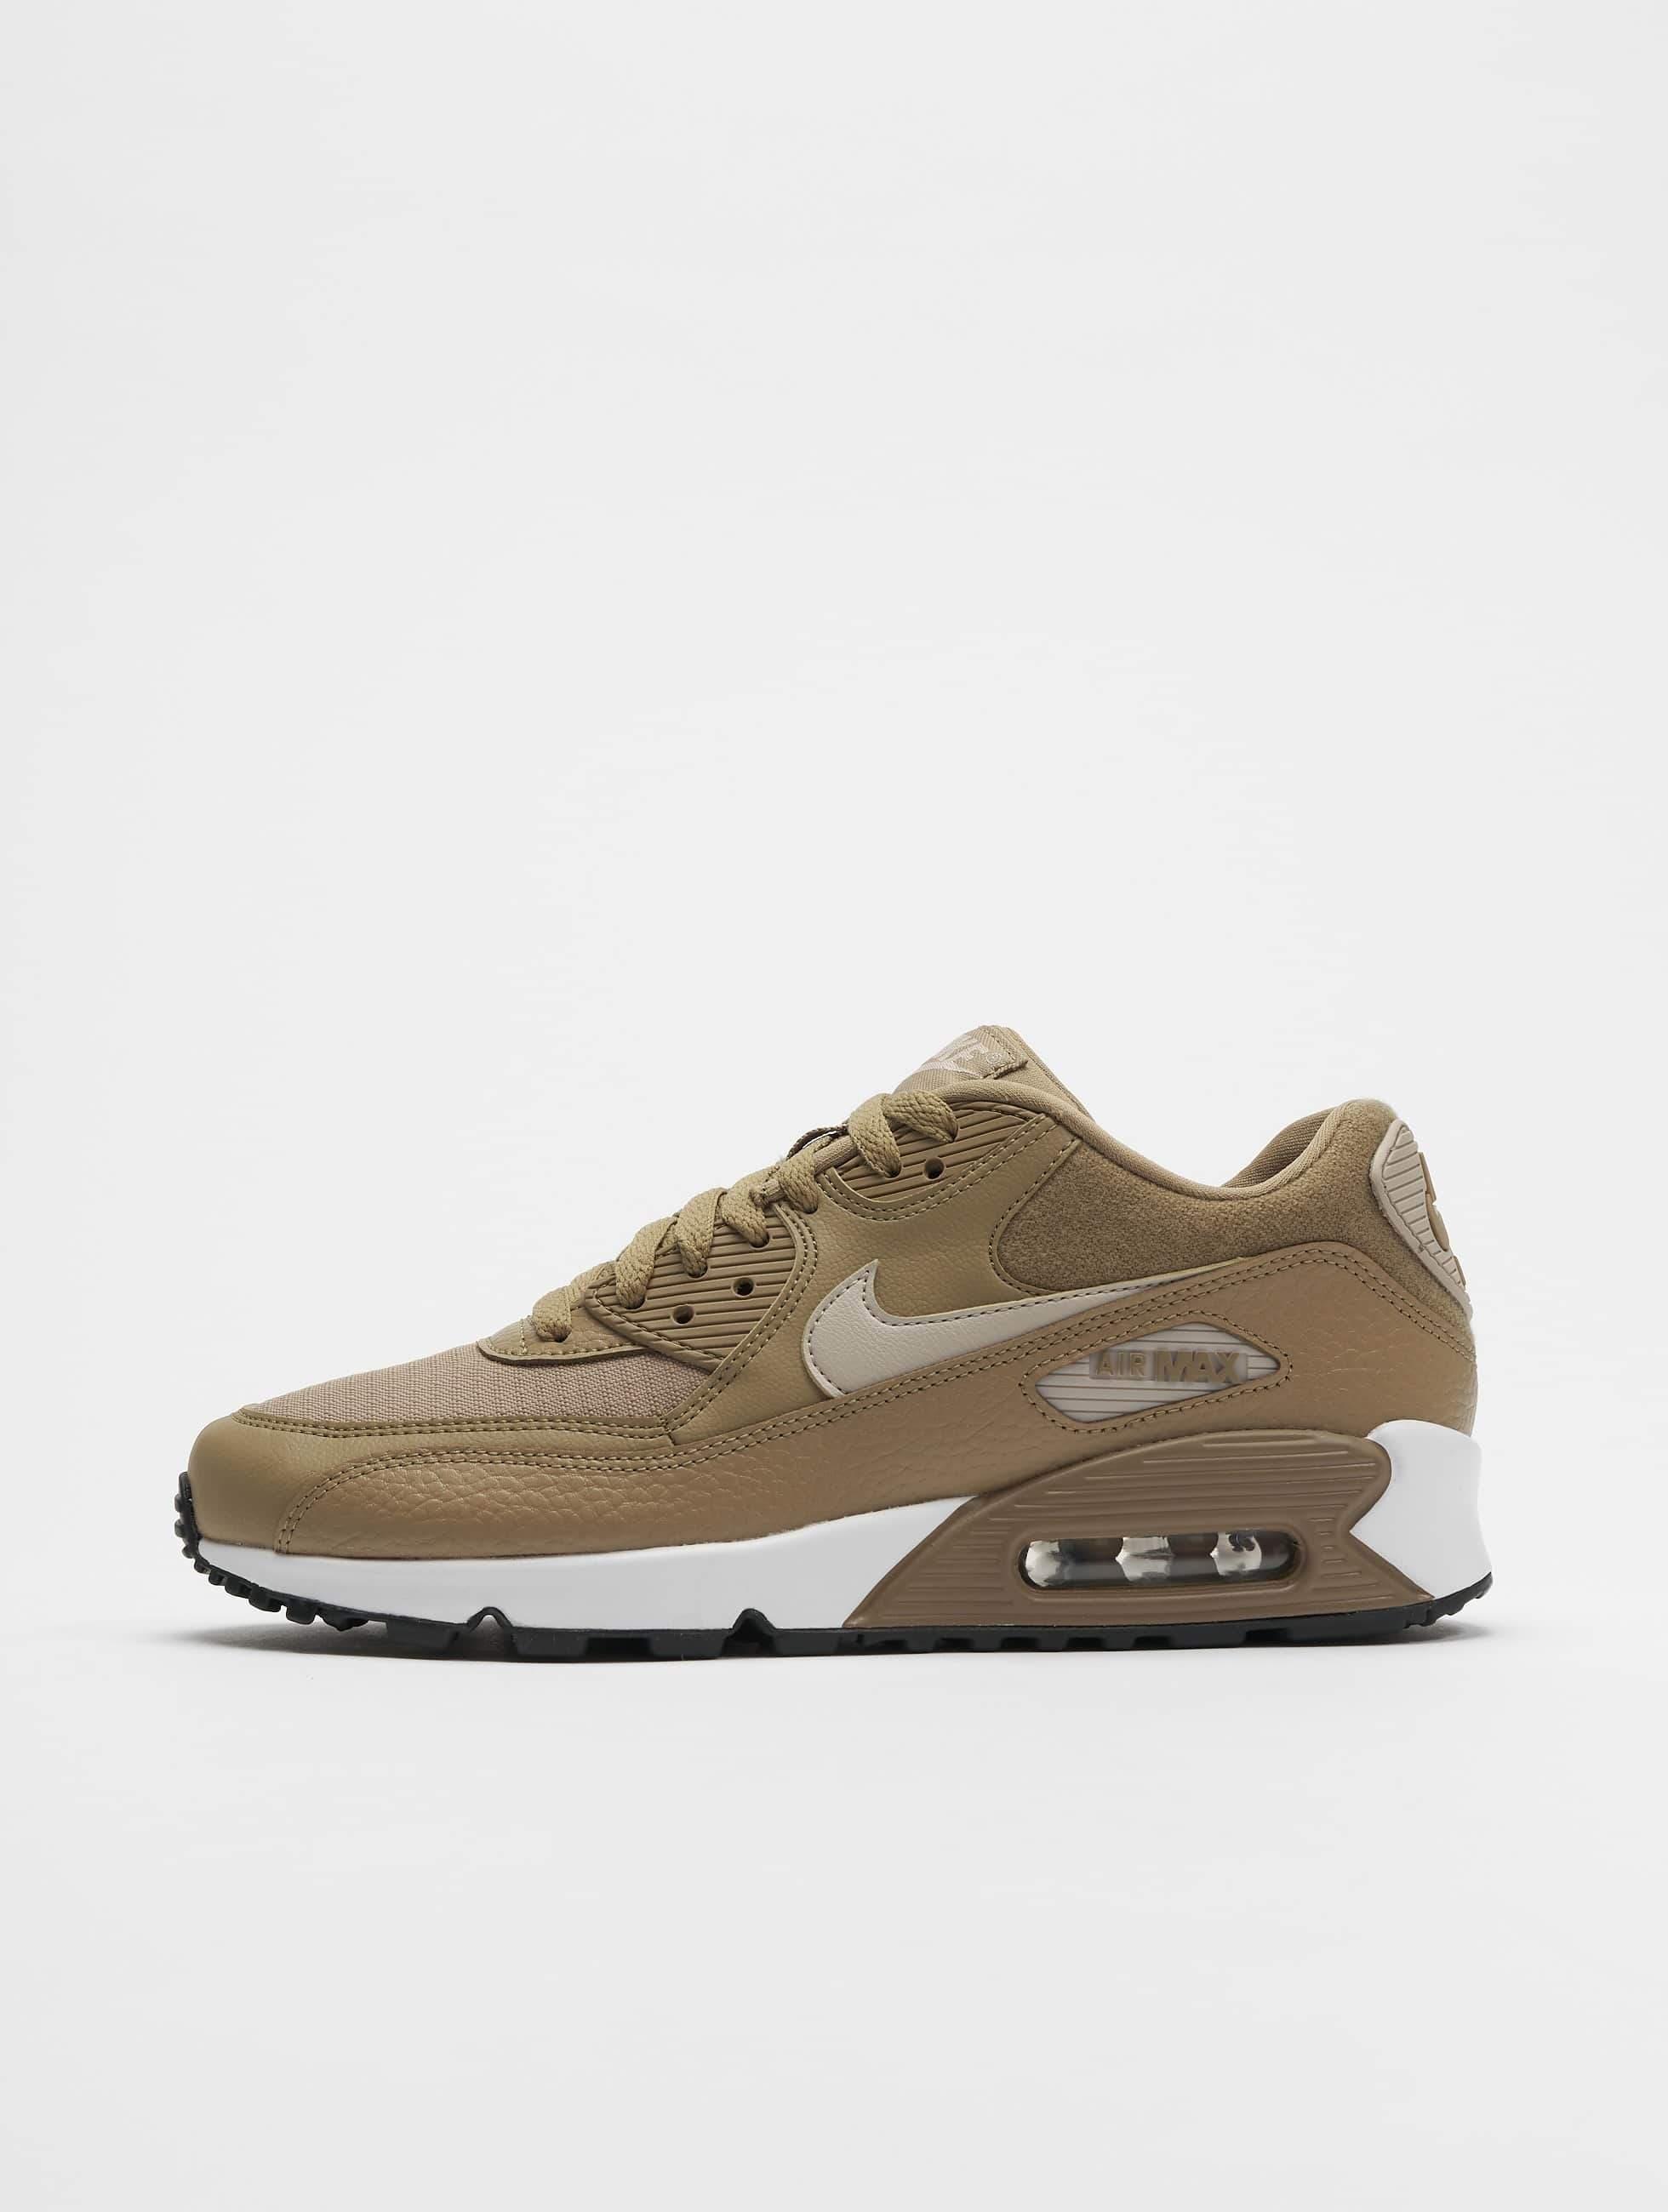 5ab304aa56d Nike schoen / sneaker Air Max in bruin 539206